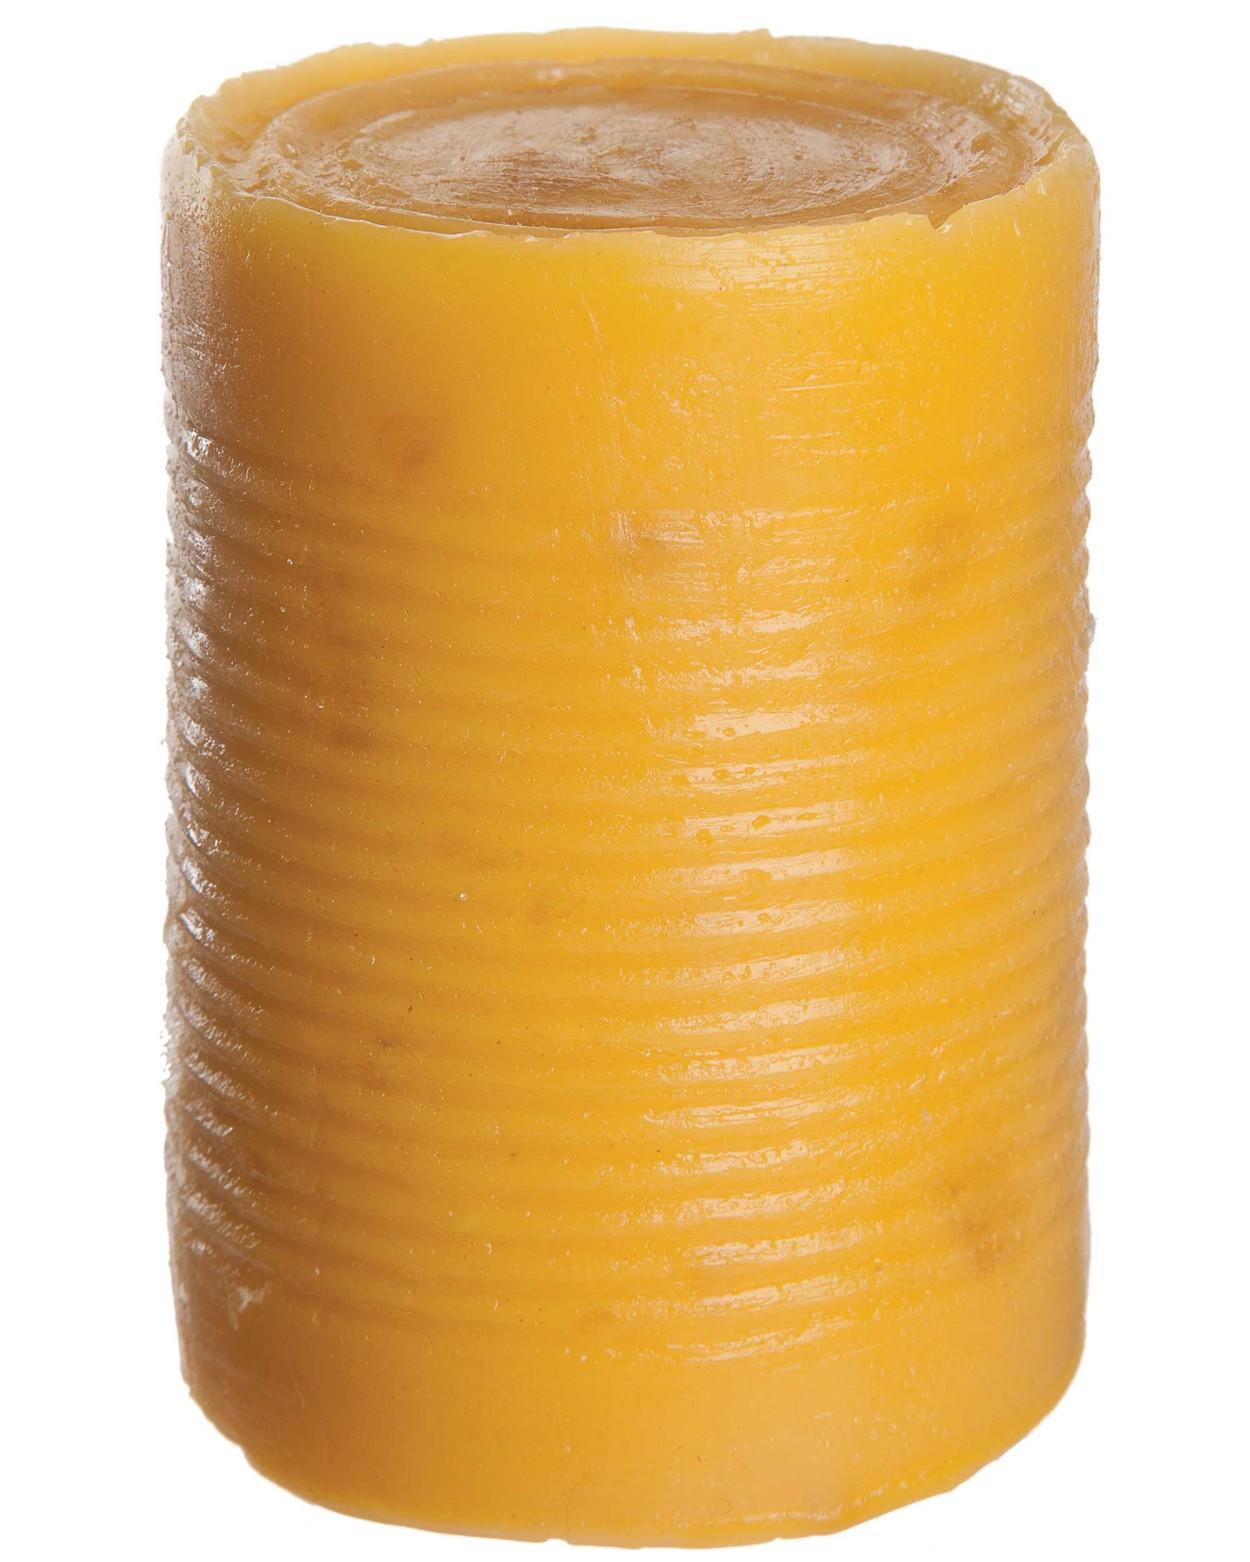 LindseyWohlman_WarholCampbellsSoupUnlabeled_cheddar-cheese-15.jpg